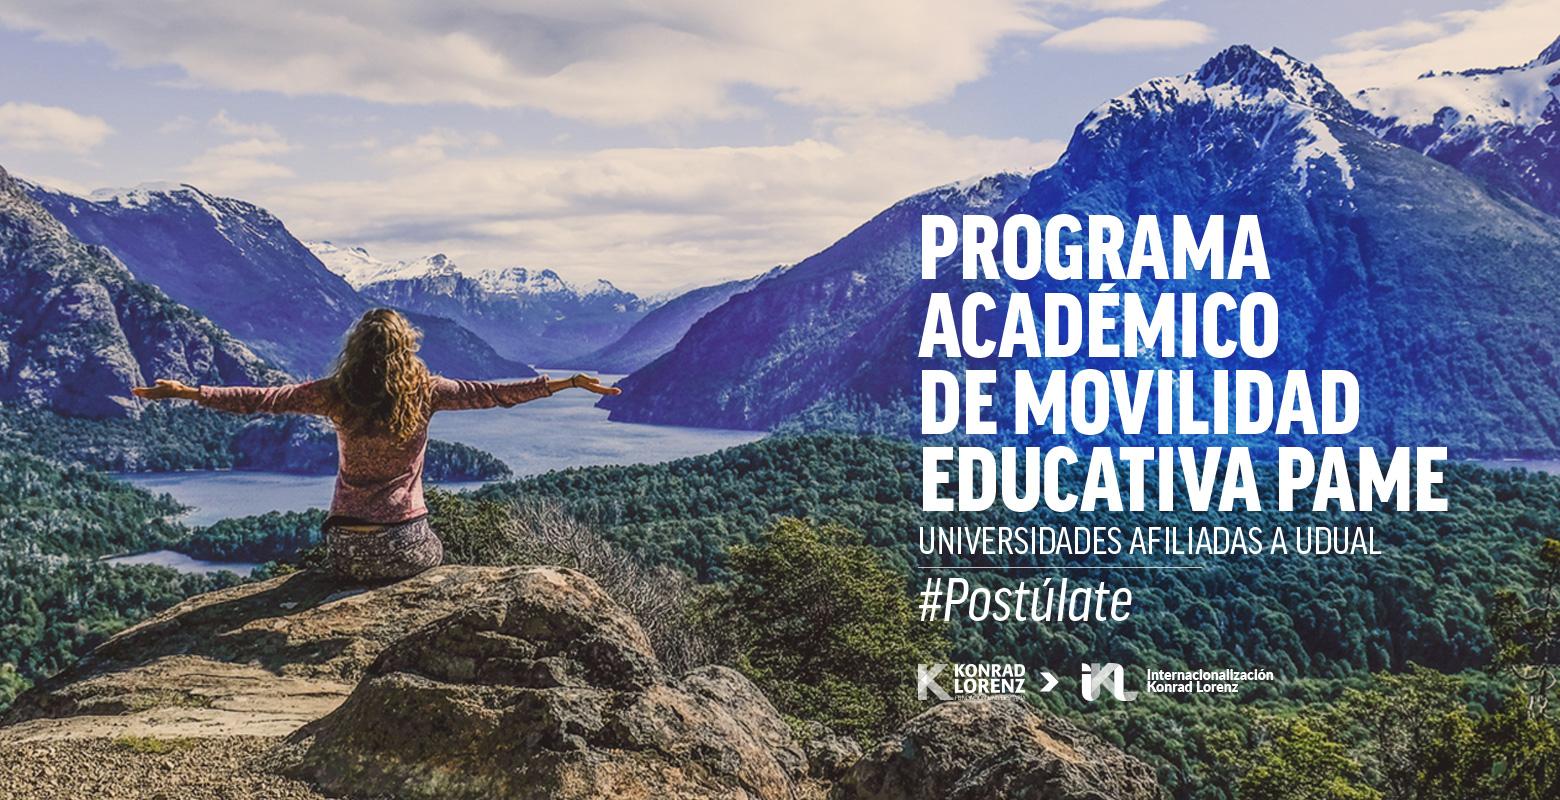 #Postúlate Programa Académico de Movilidad Educativa (PAME)